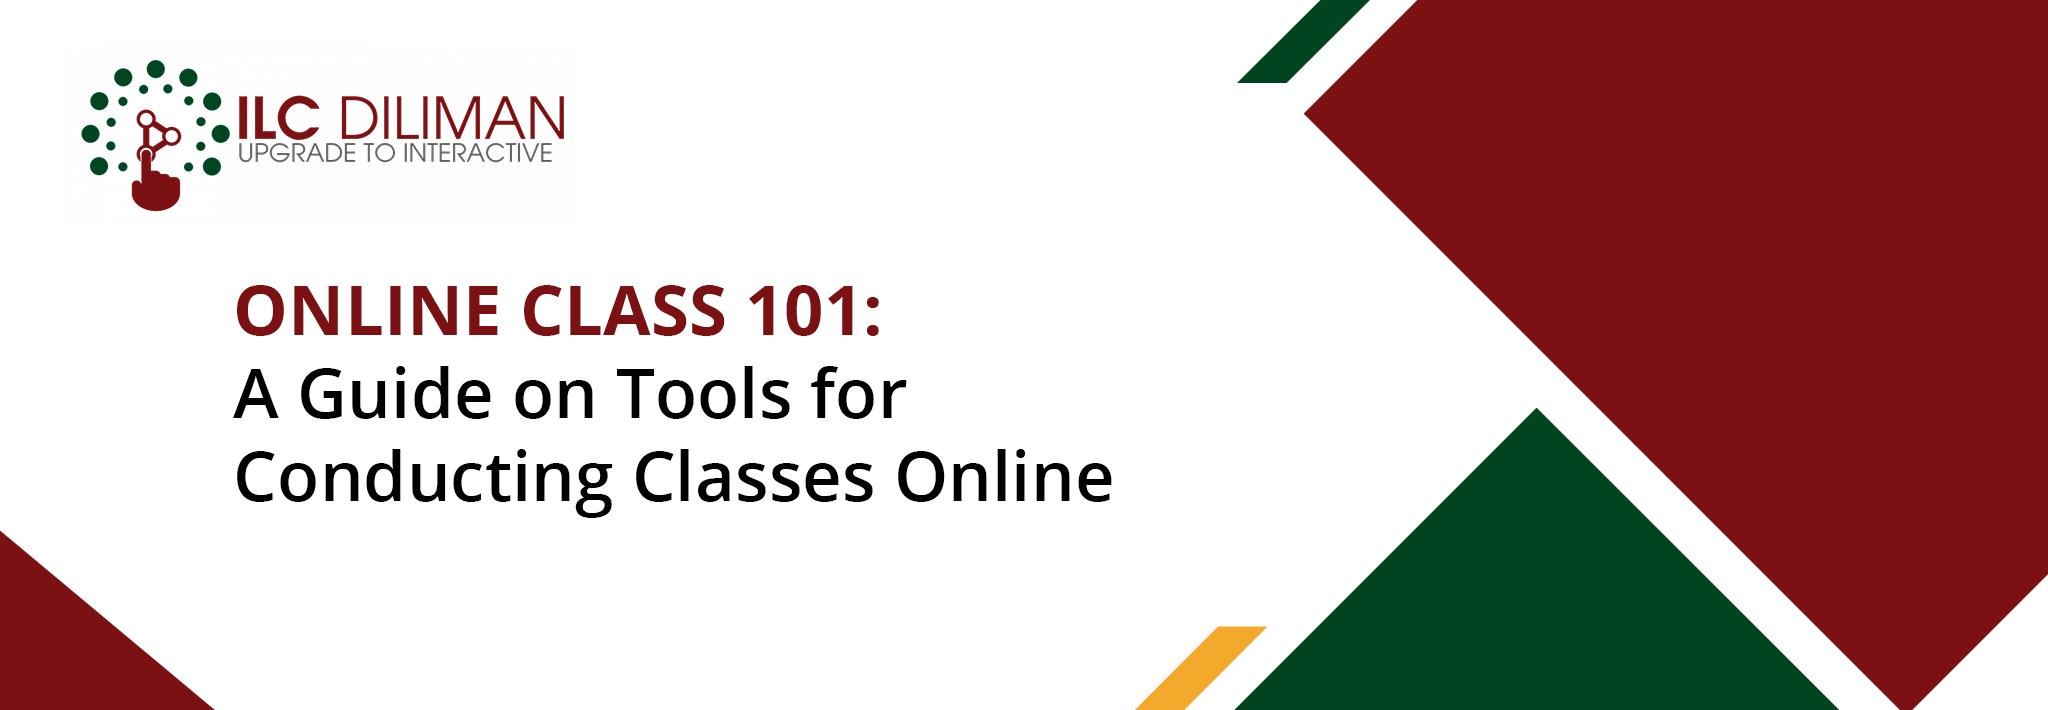 OnlineClass101.png